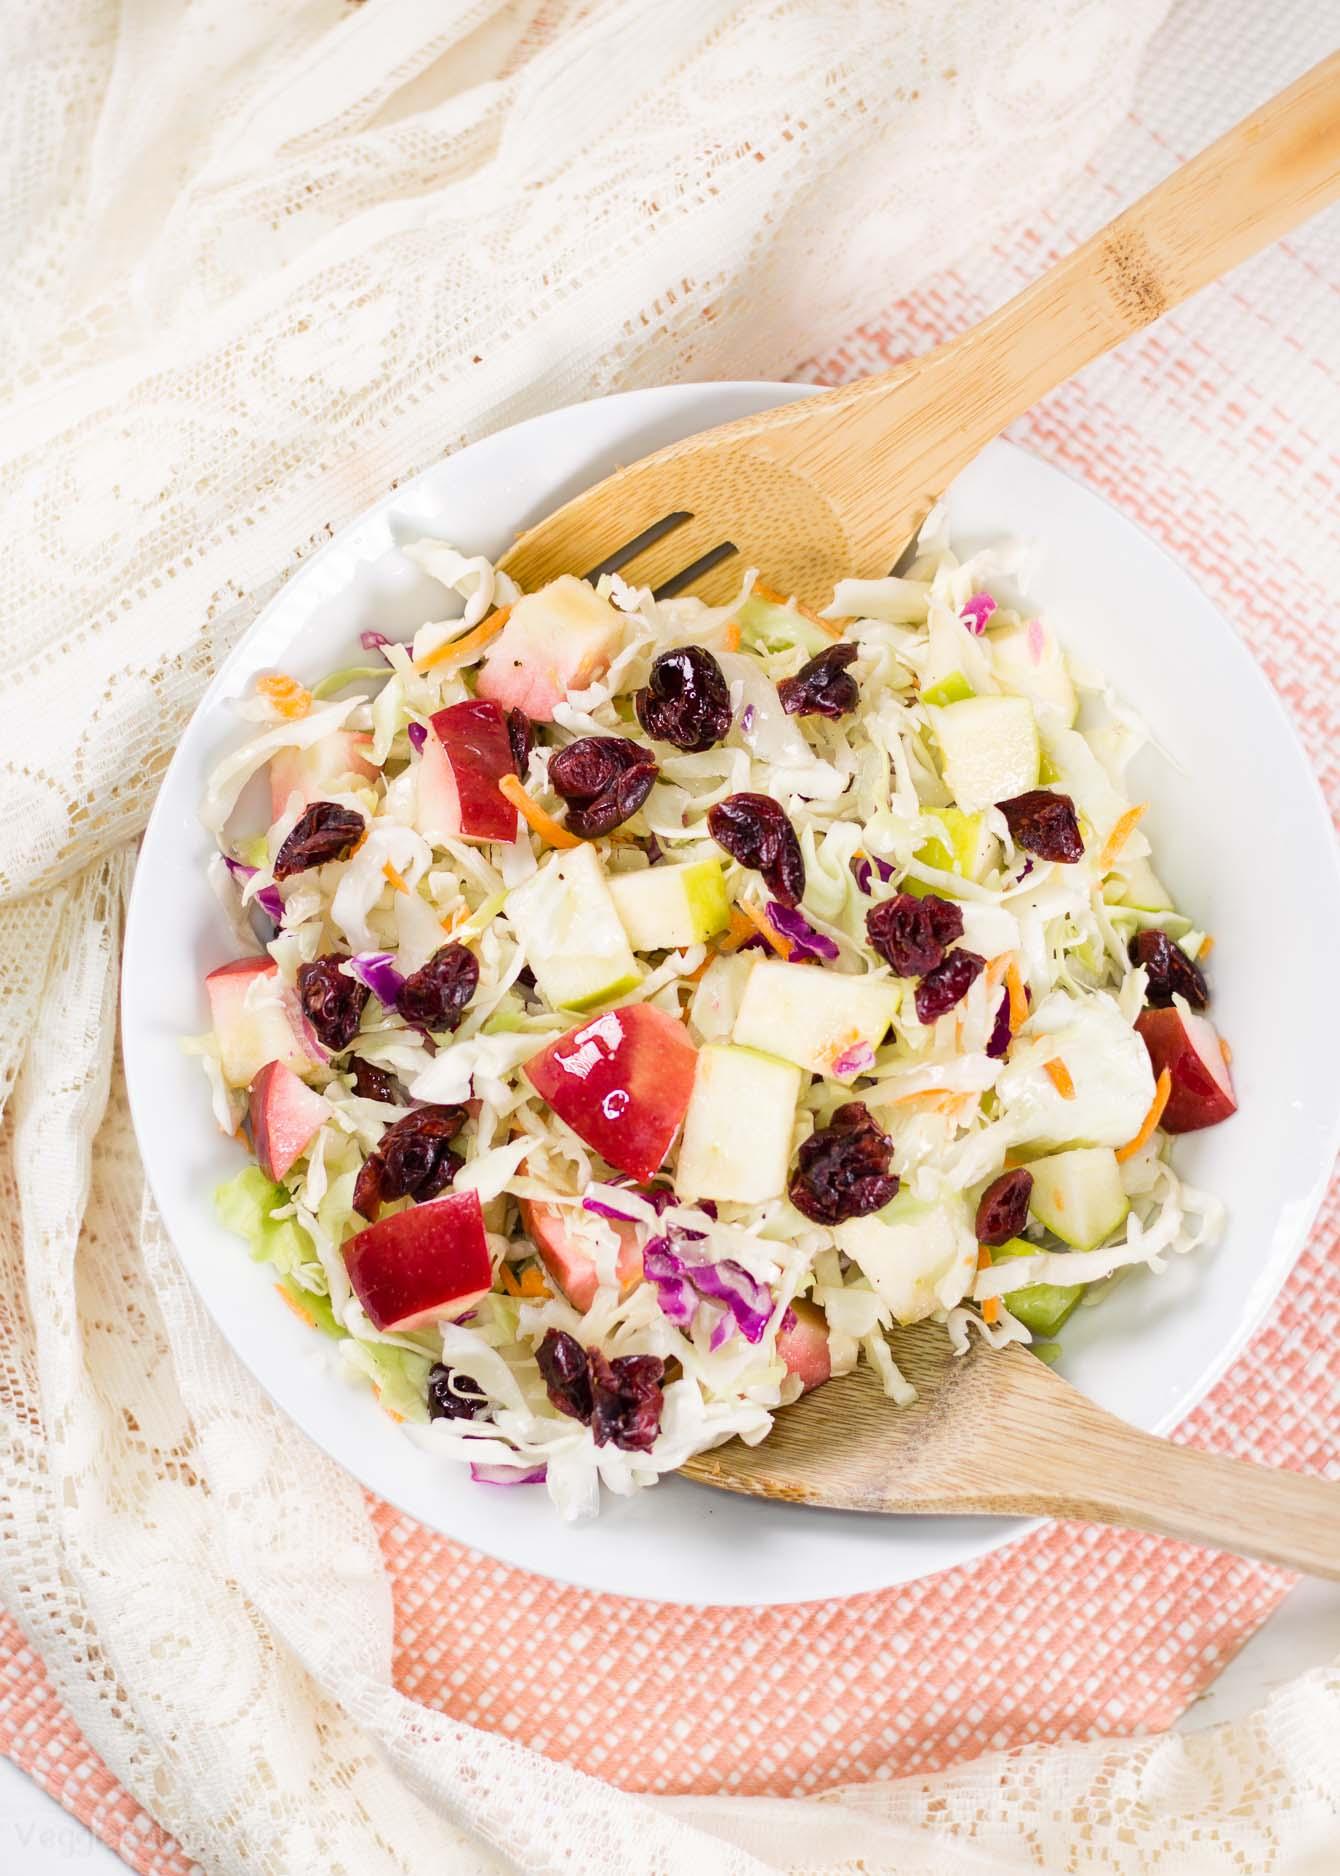 Apple Cranberry Almond Coleslaw Salad recipe